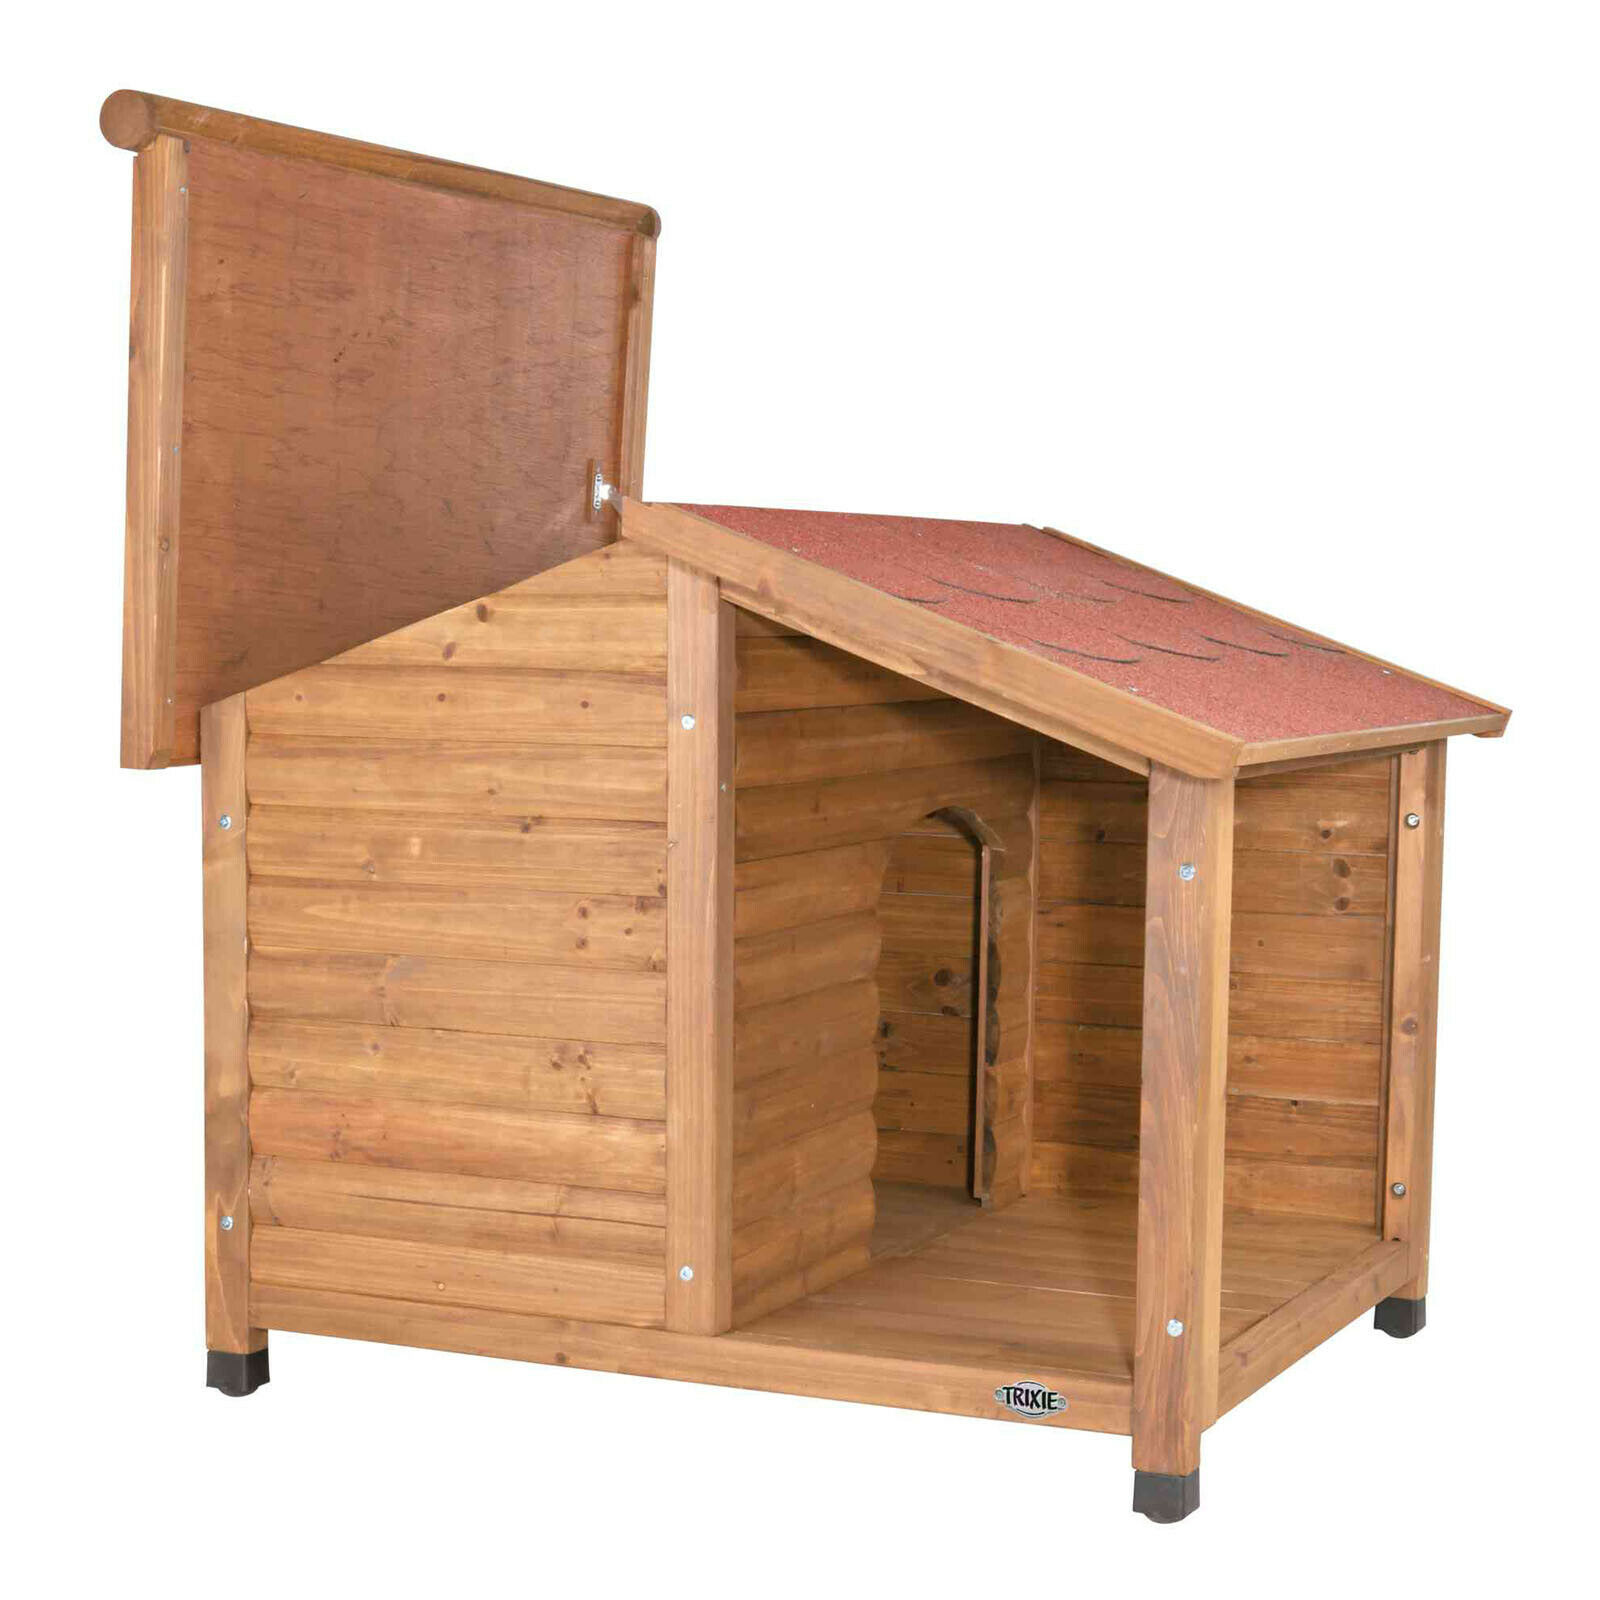 Trixie natura Hundehütte Lodge mit Satteldach Hundehaus Hundebox Hundehöhle